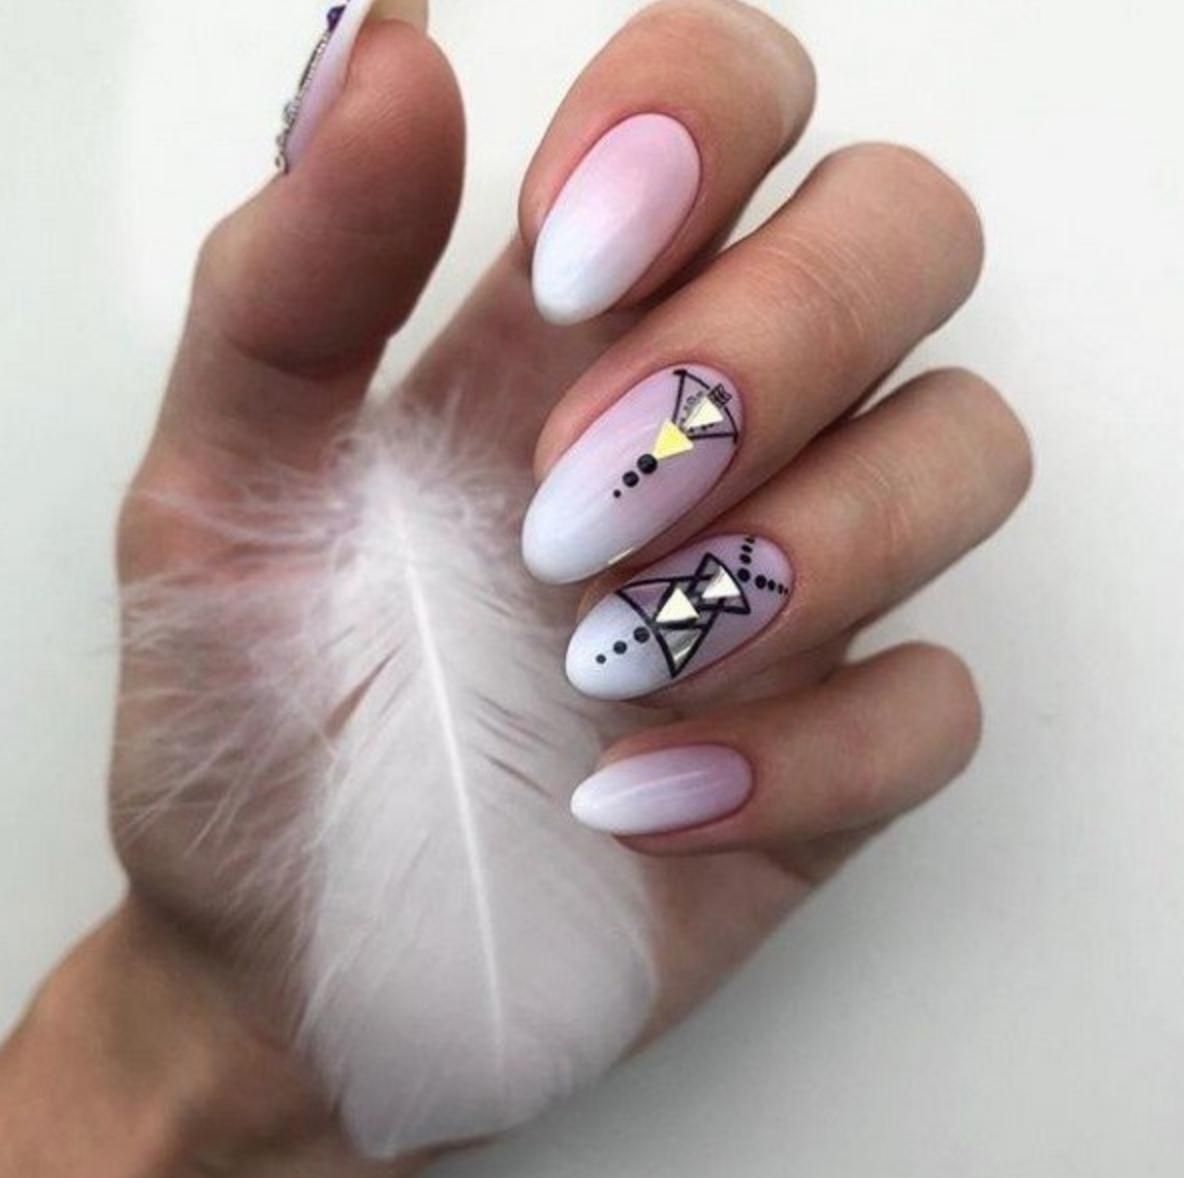 Nail Designs Nailbook Art Designs 2019 Graduation Nail Art Graduation Nails Nail Designs Valentines